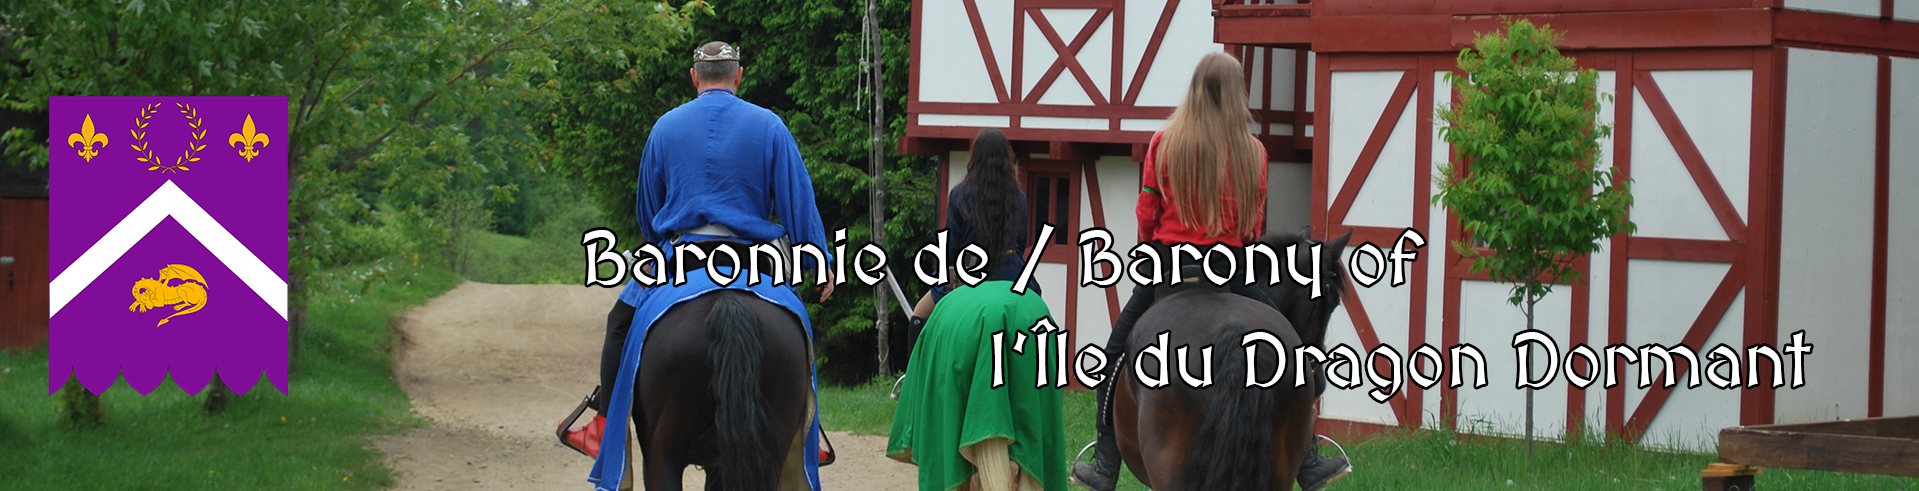 Barony of l'Ile du Dragon Dormant